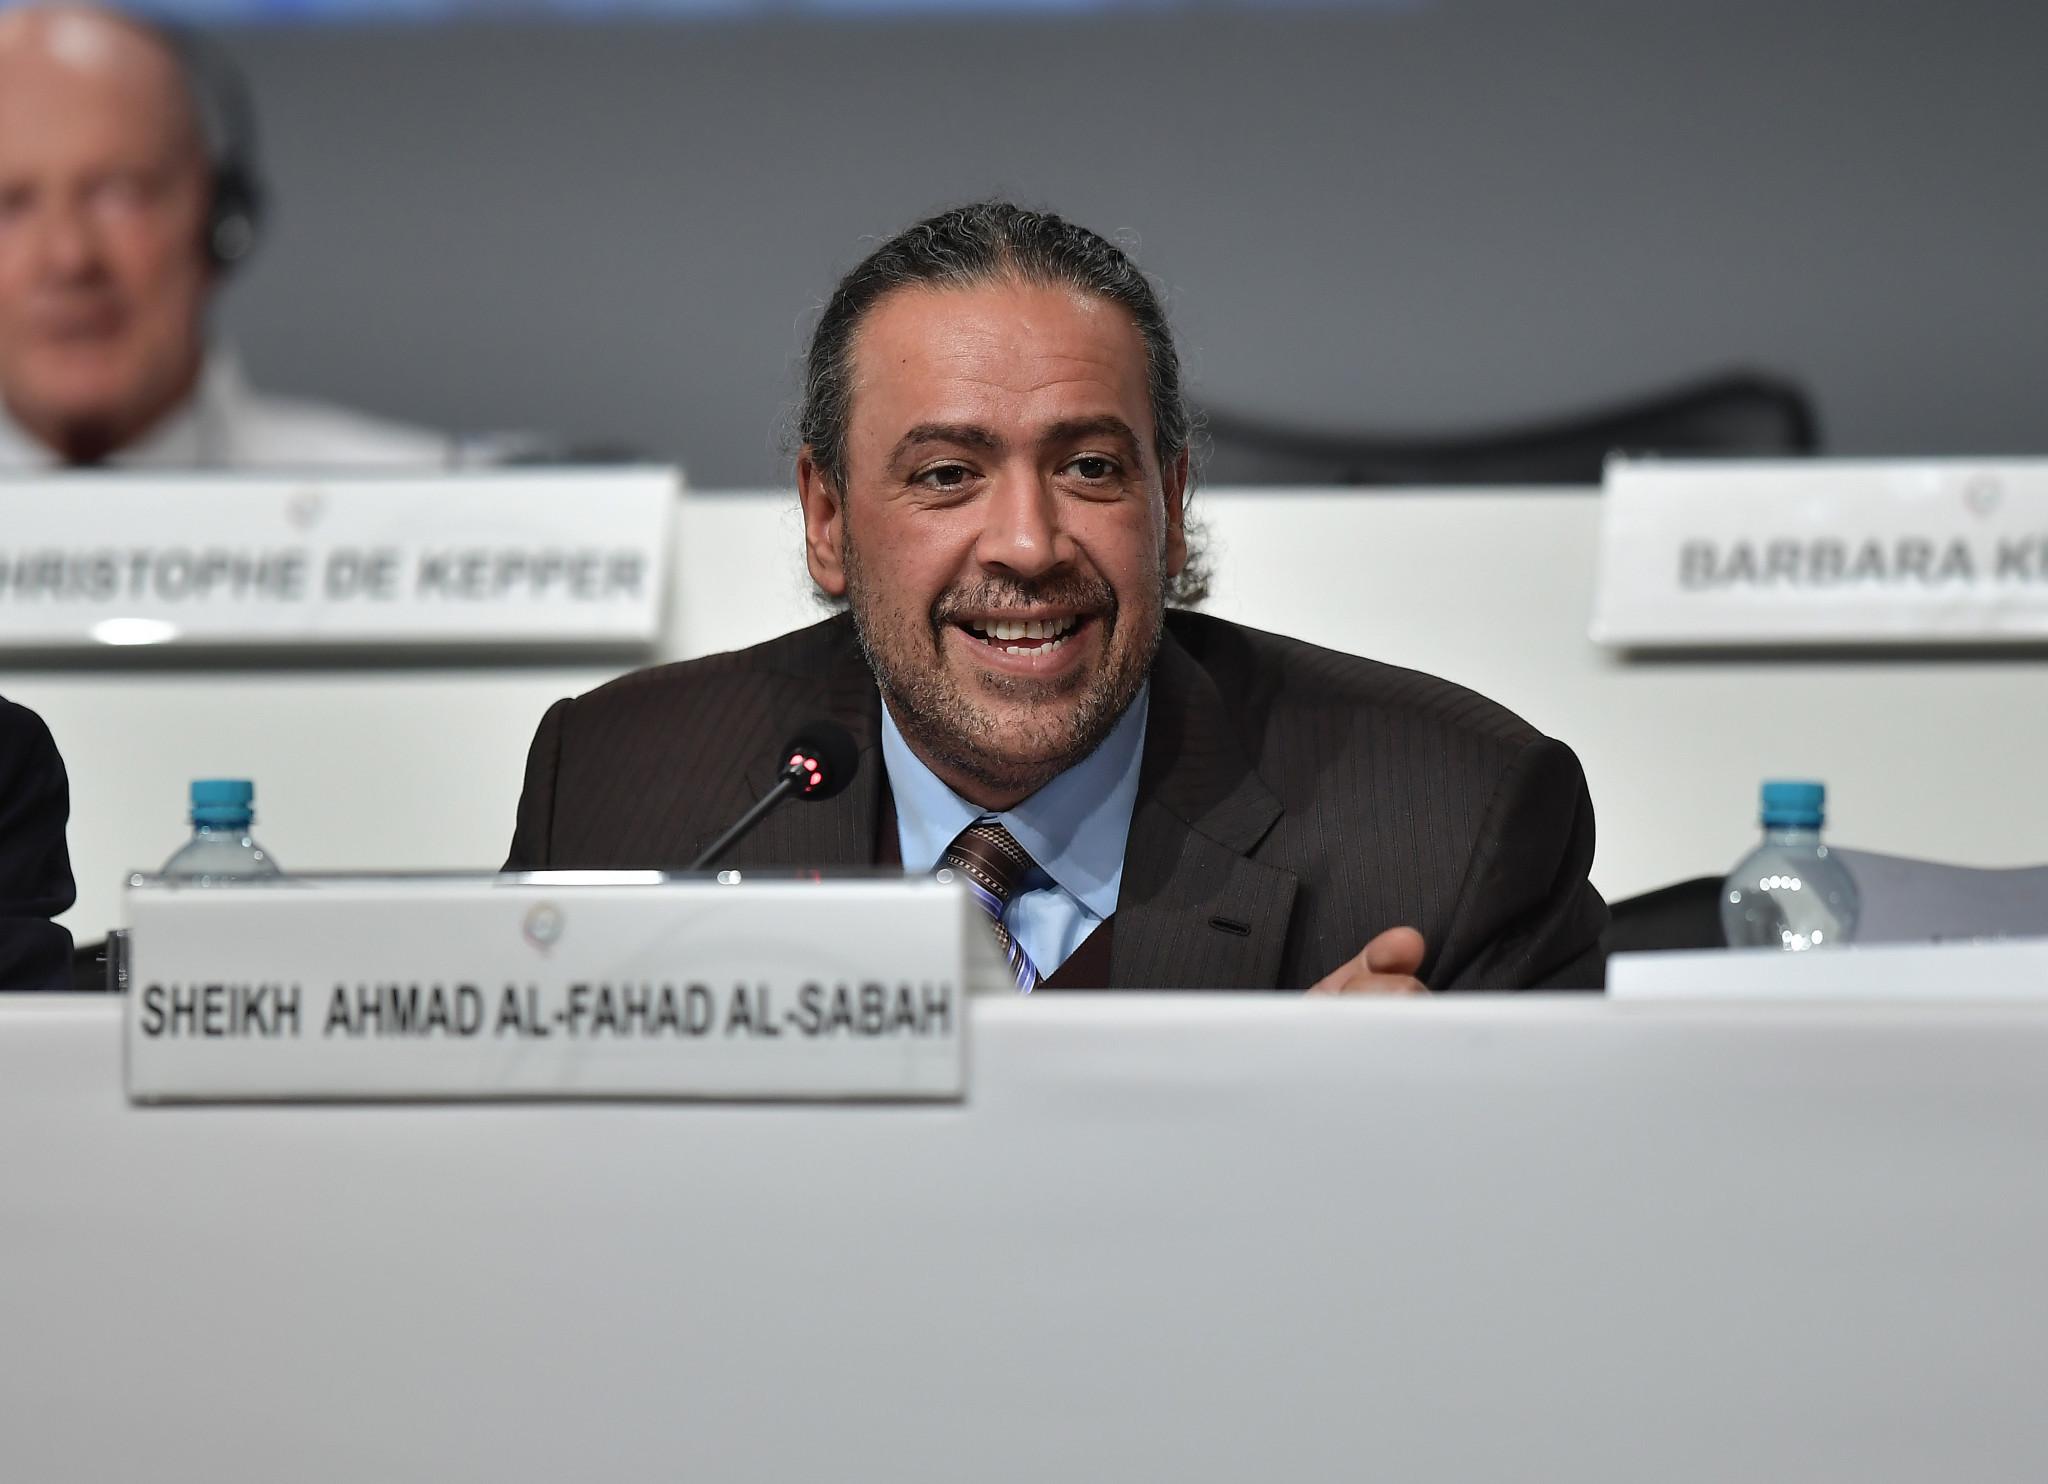 Sheikh Ahmad Al-Fahad Al-Sabah is President of ANOC ©Getty Images